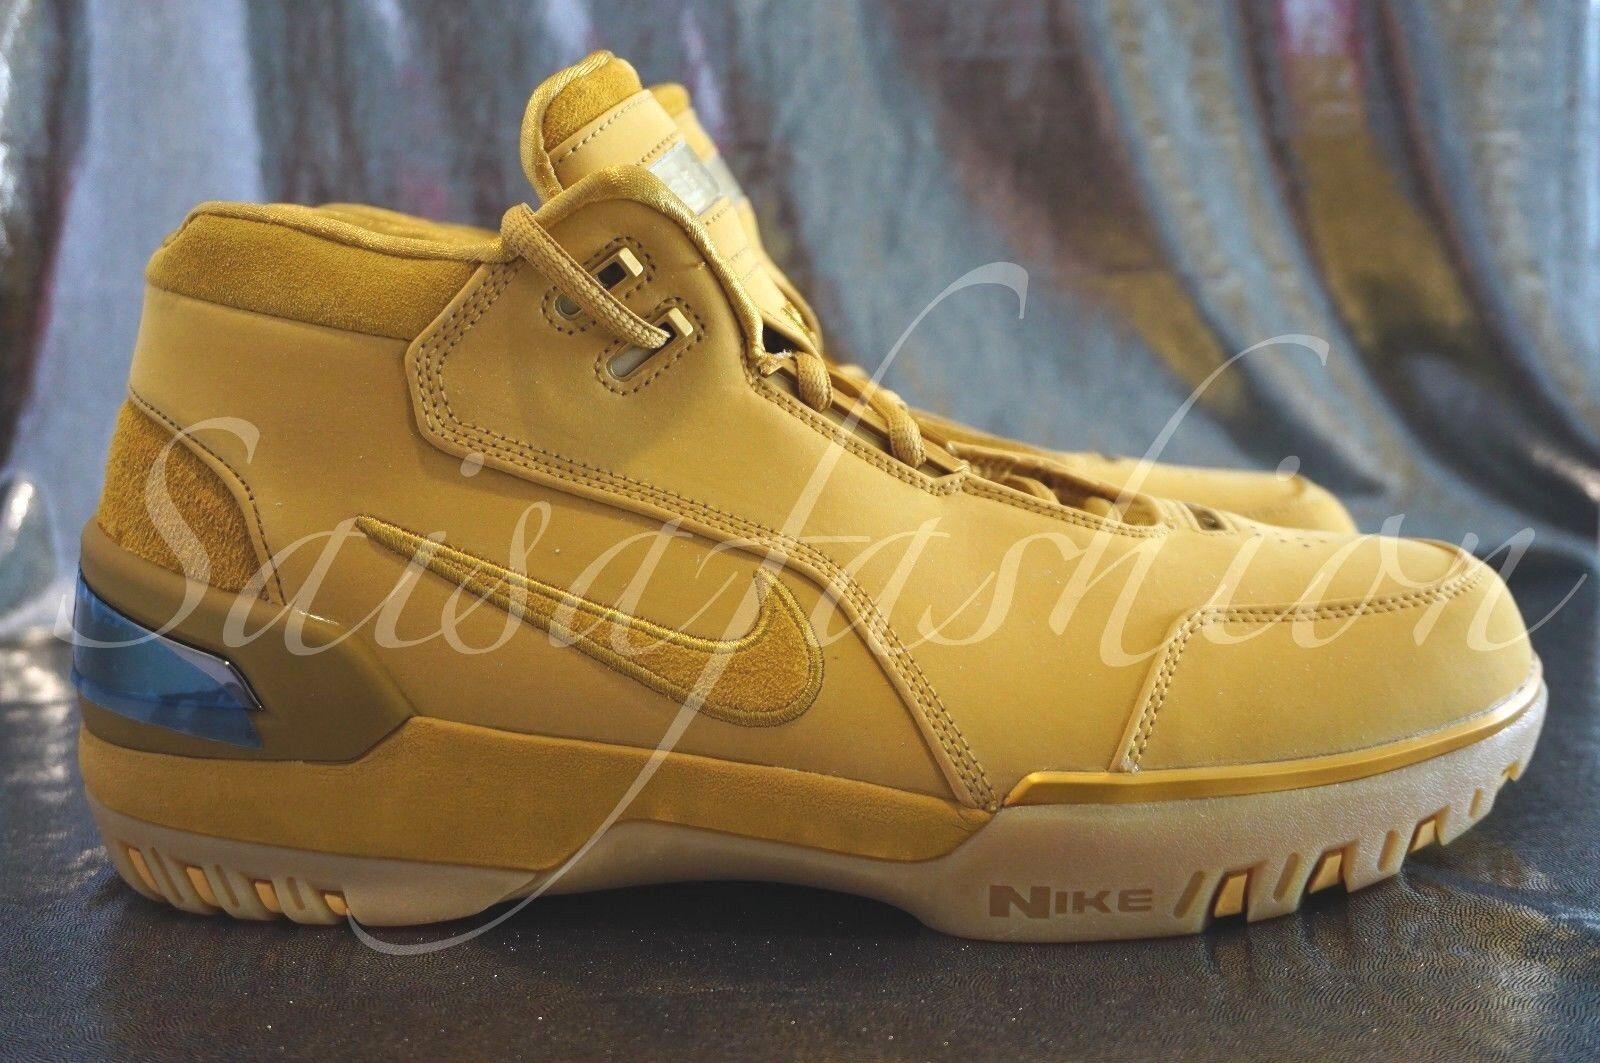 Nike Air Zoom generación ASG QS aq0110-700 'Wheat Oro' El LeBron James SZ 9.5 El Oro' modelo mas vendido de la marca 42d92a